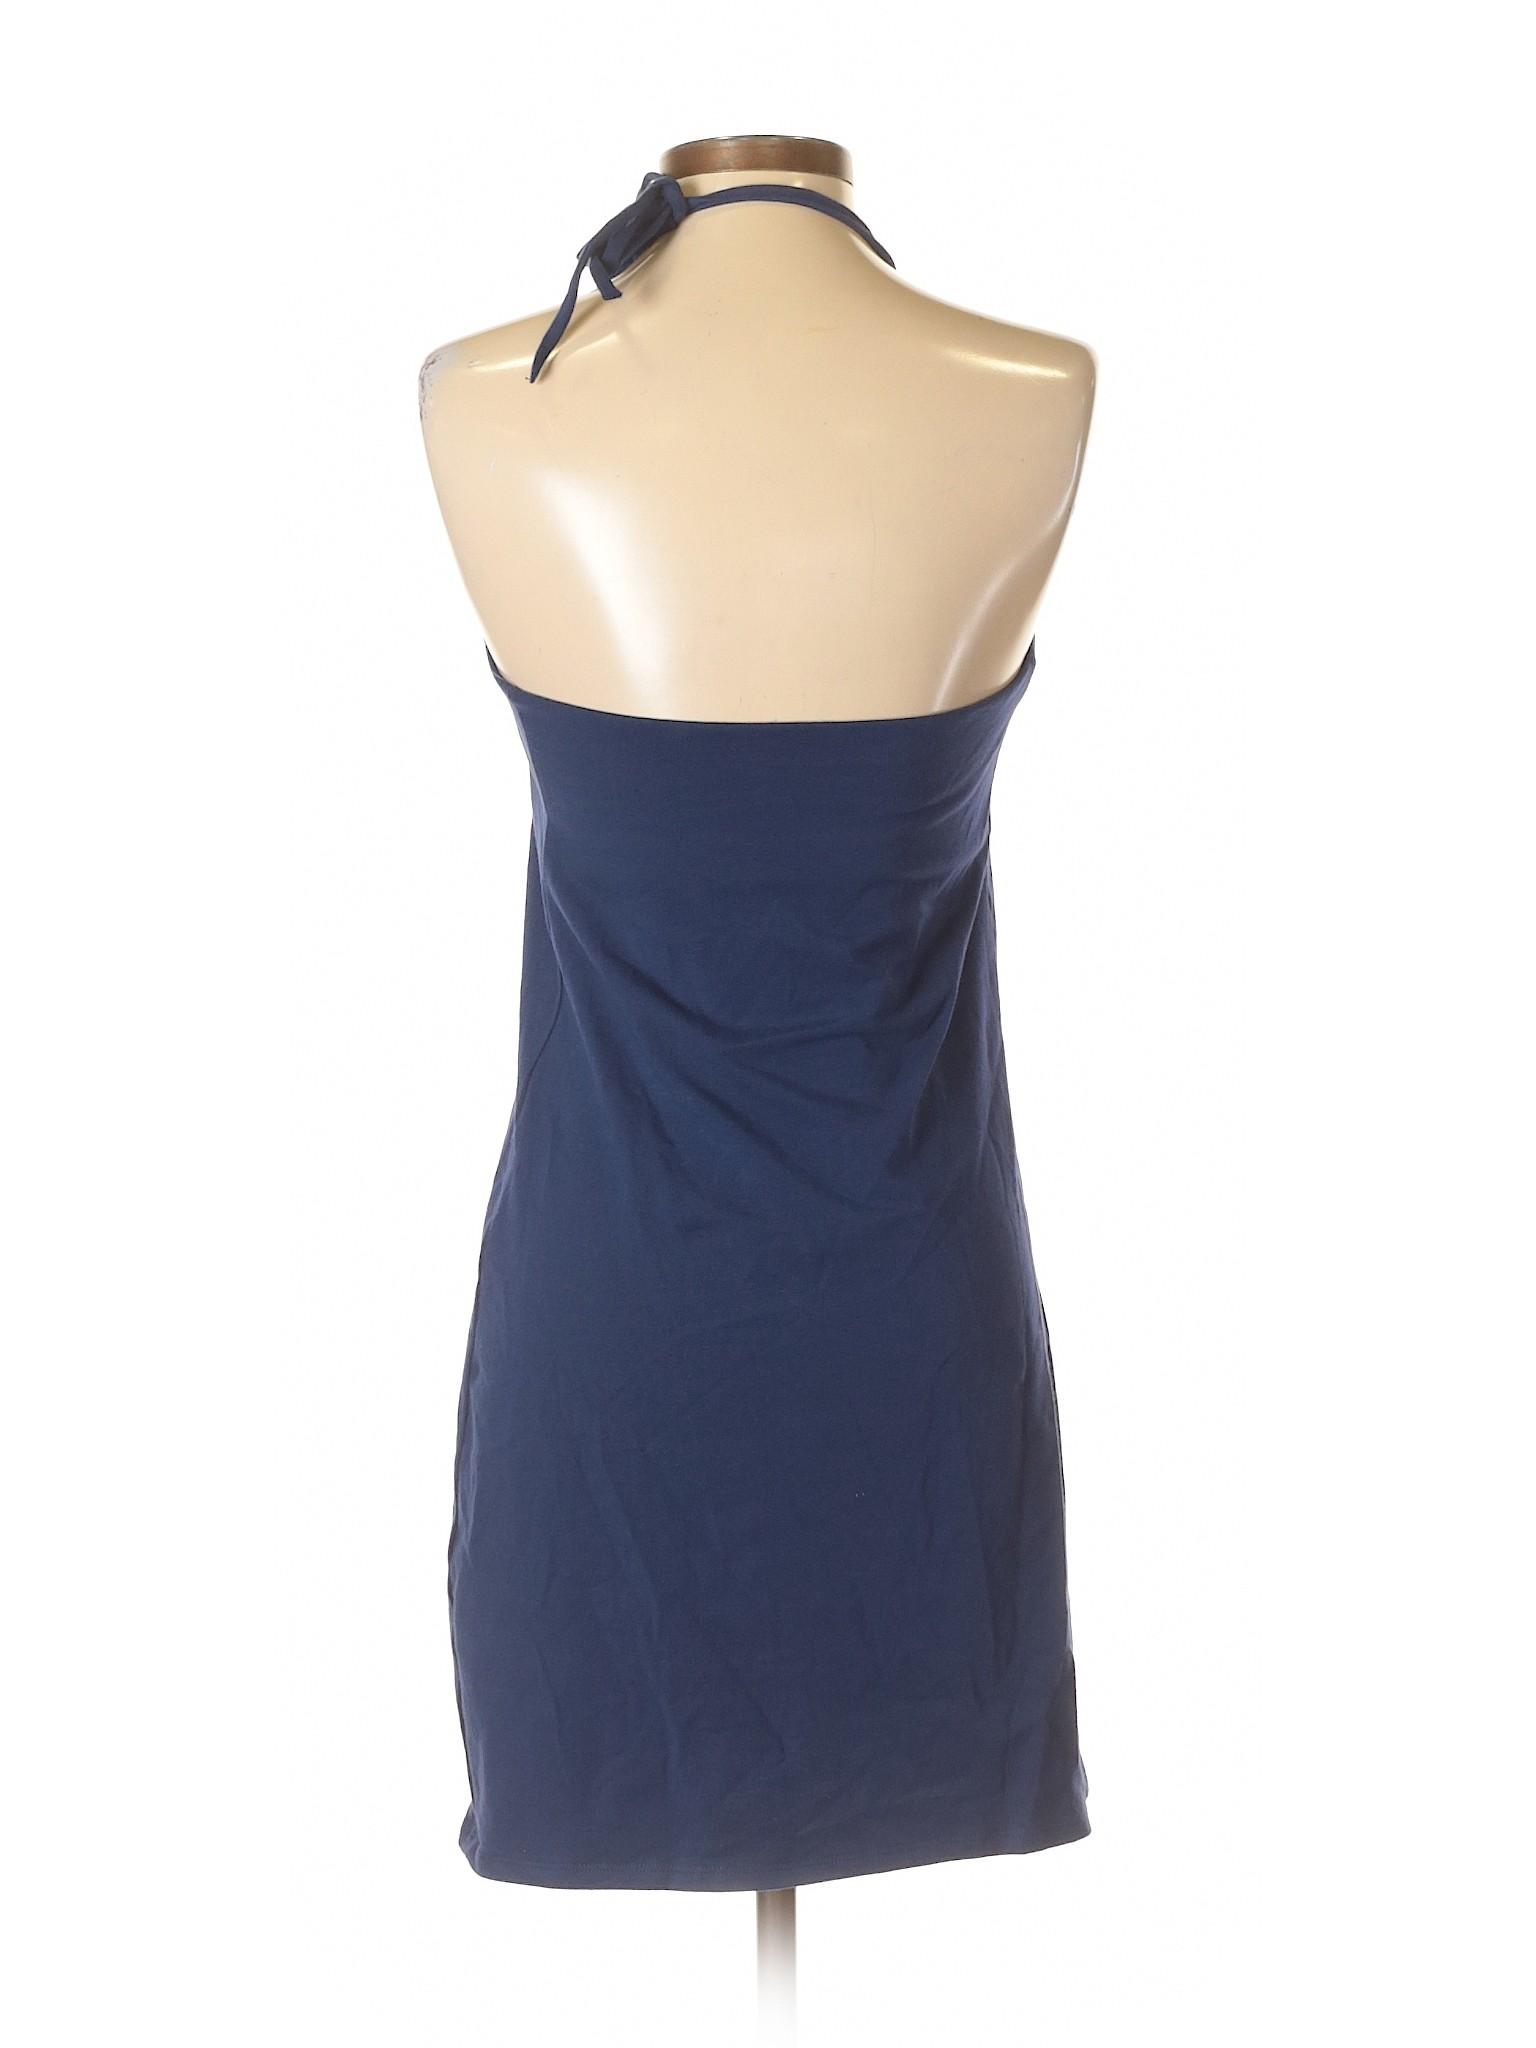 winter Tops Casual Dress Boutique VS Bra 0P1qwUw